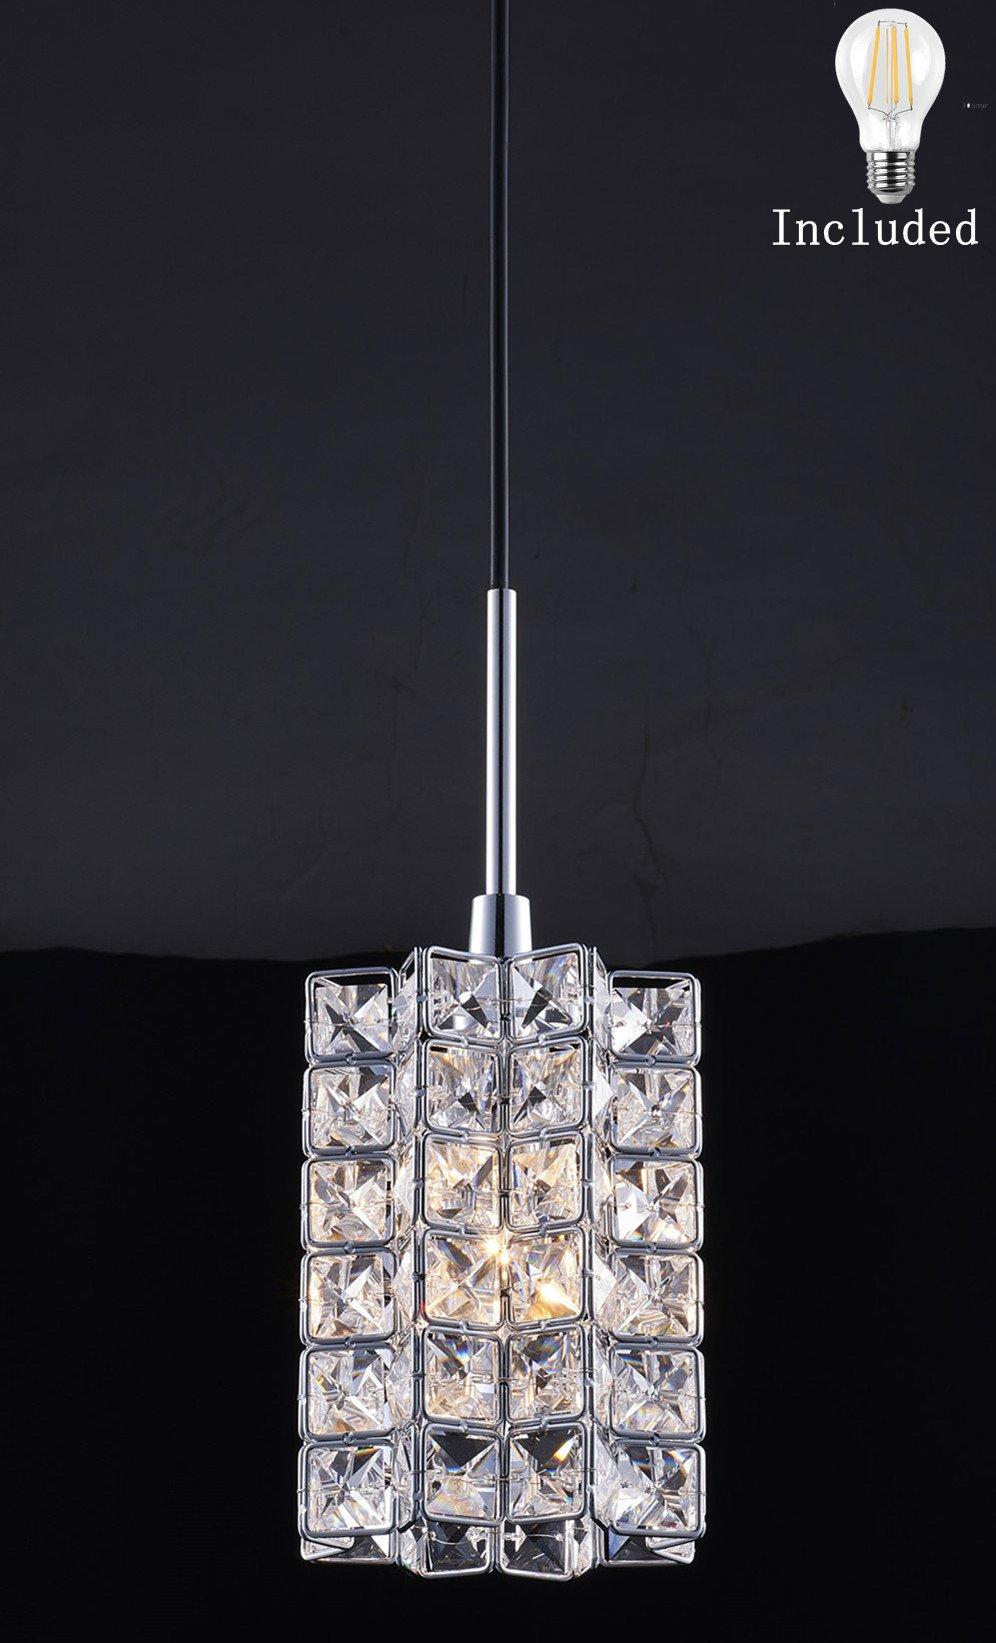 Smart Lighting-Shupregu 1-light pendant lighting, Crystal mini pendant light fixtures,Chrome finish crystal pendant lamp, for Kitchen Island, Dining room, Cafe,Bar,Dimmer LED bulb Included by SHUPREGU